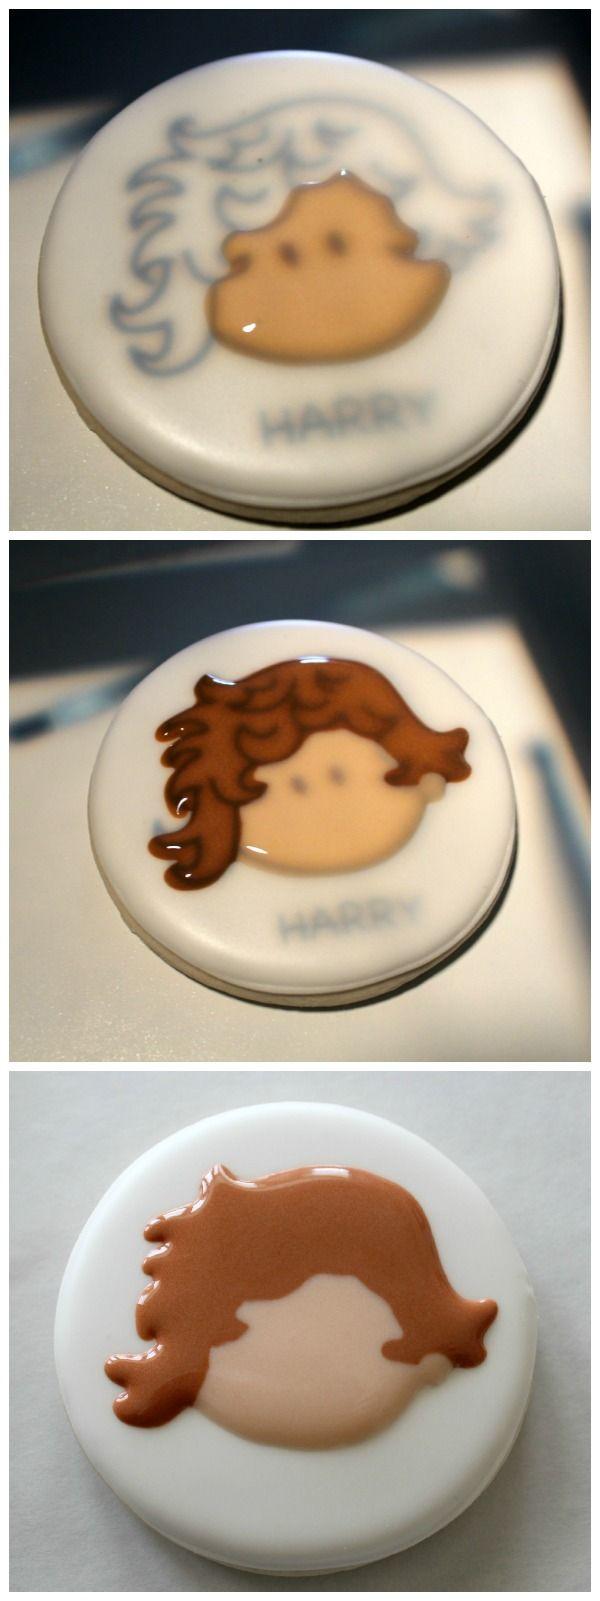 One Direction Cookies and a Printable Kopykake Template